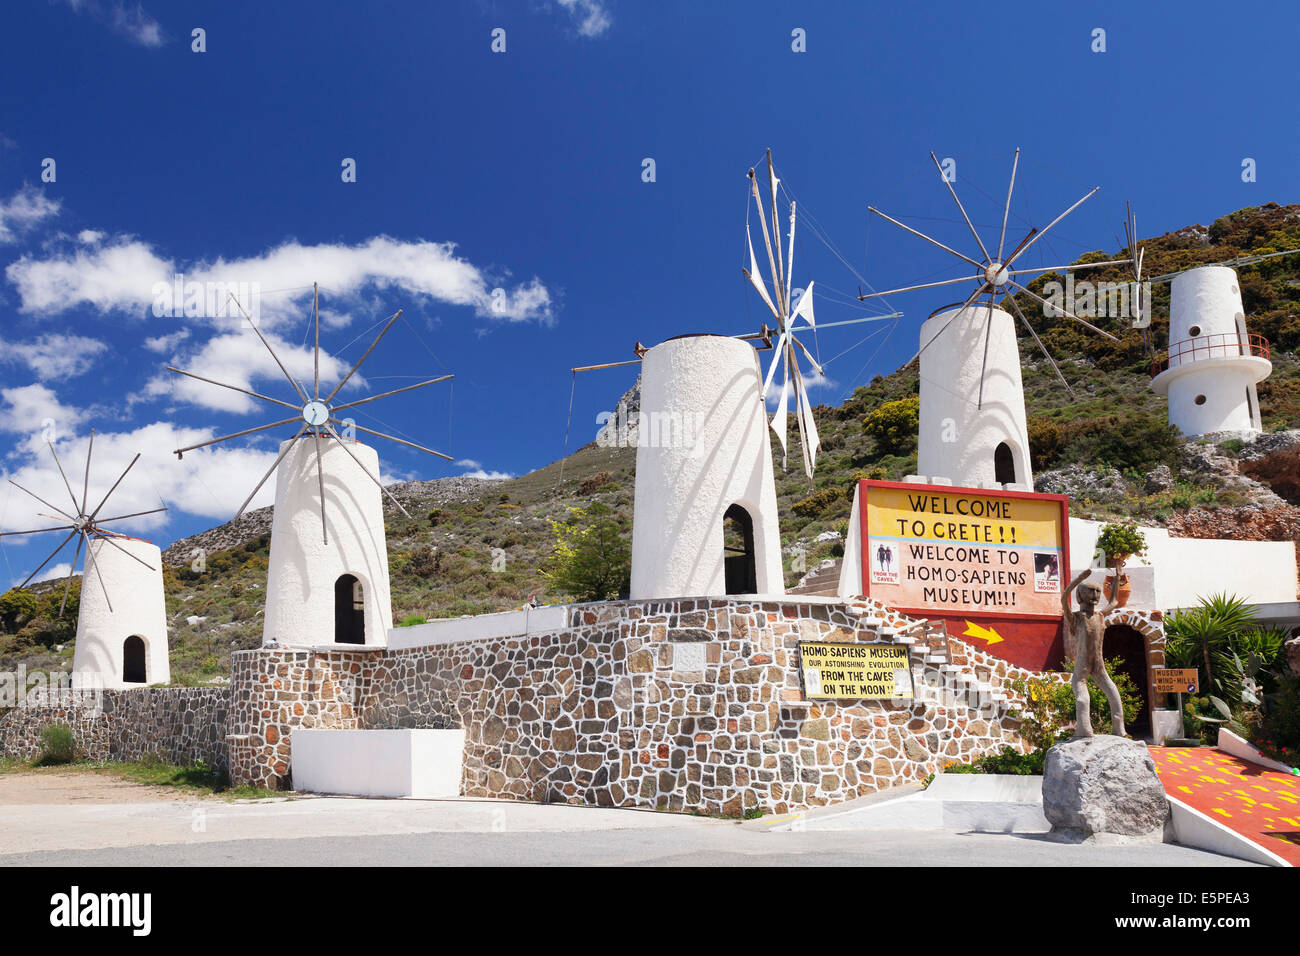 Windmühlen, Lassithi-Hochebene, Kreta, Griechenland Stockbild